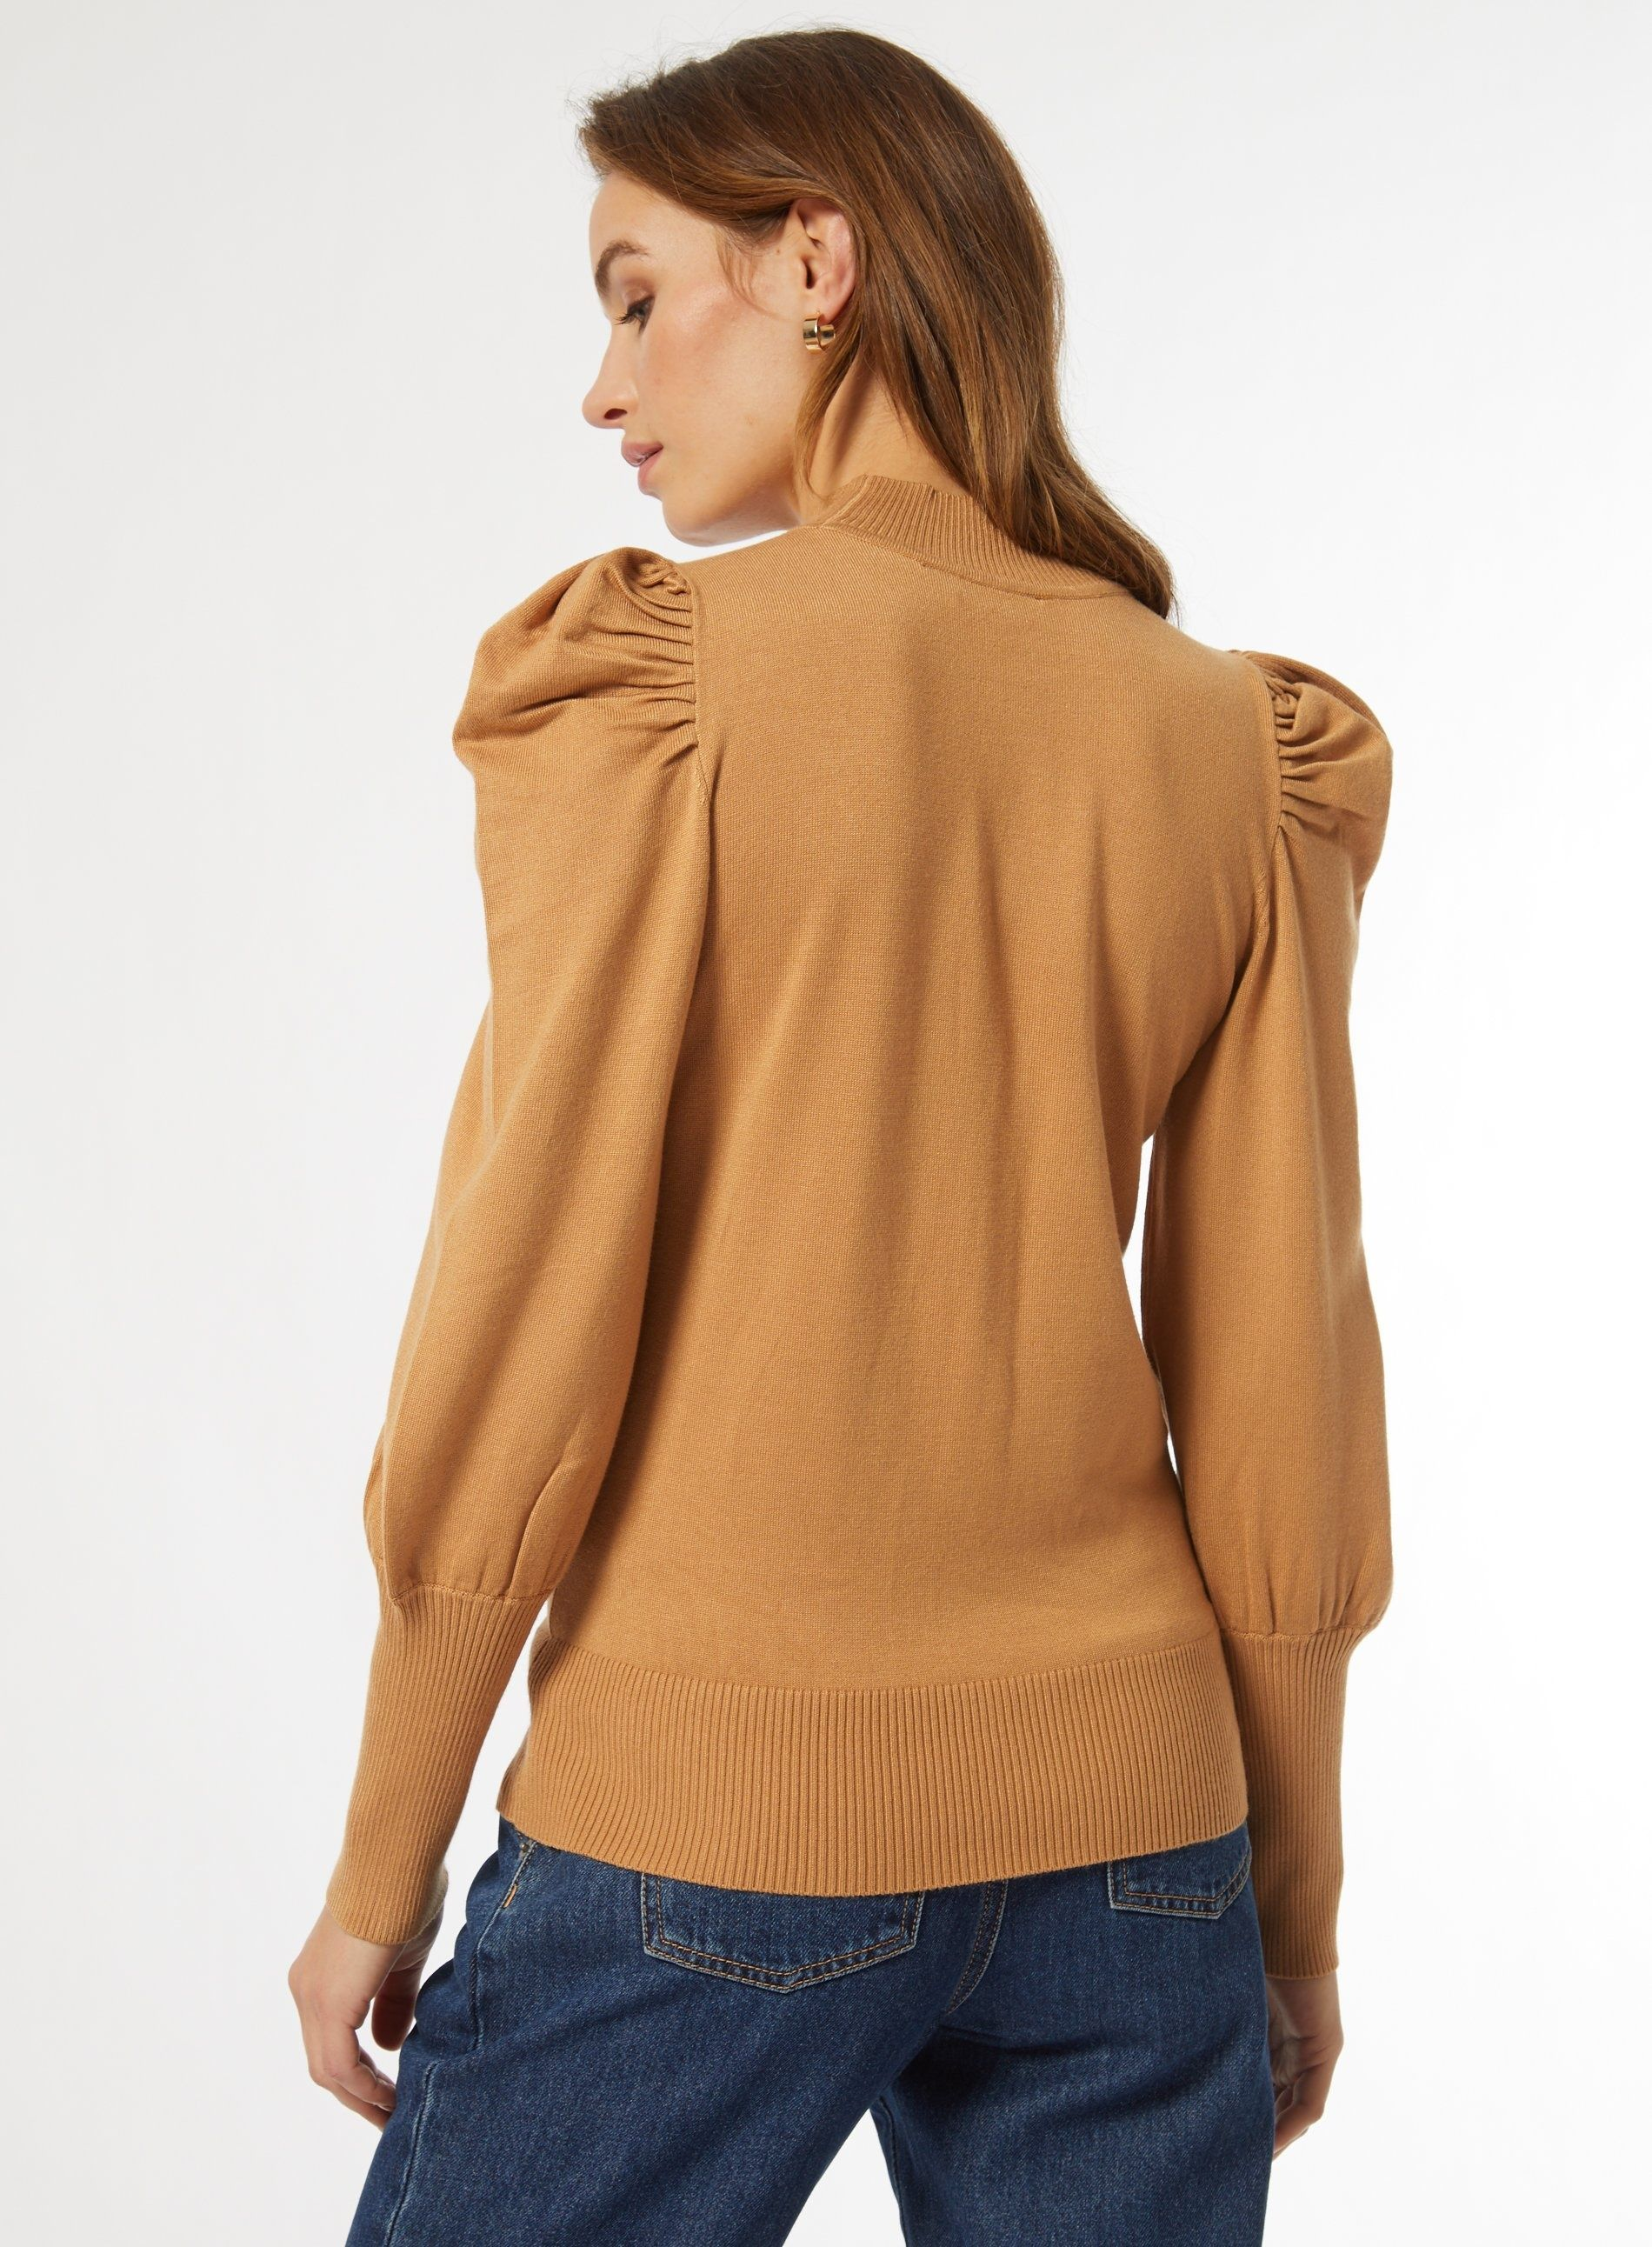 Dorothy Perkins Womens Camel Volume Sleeve Jumper Warm Sweater Pullover Knitwear